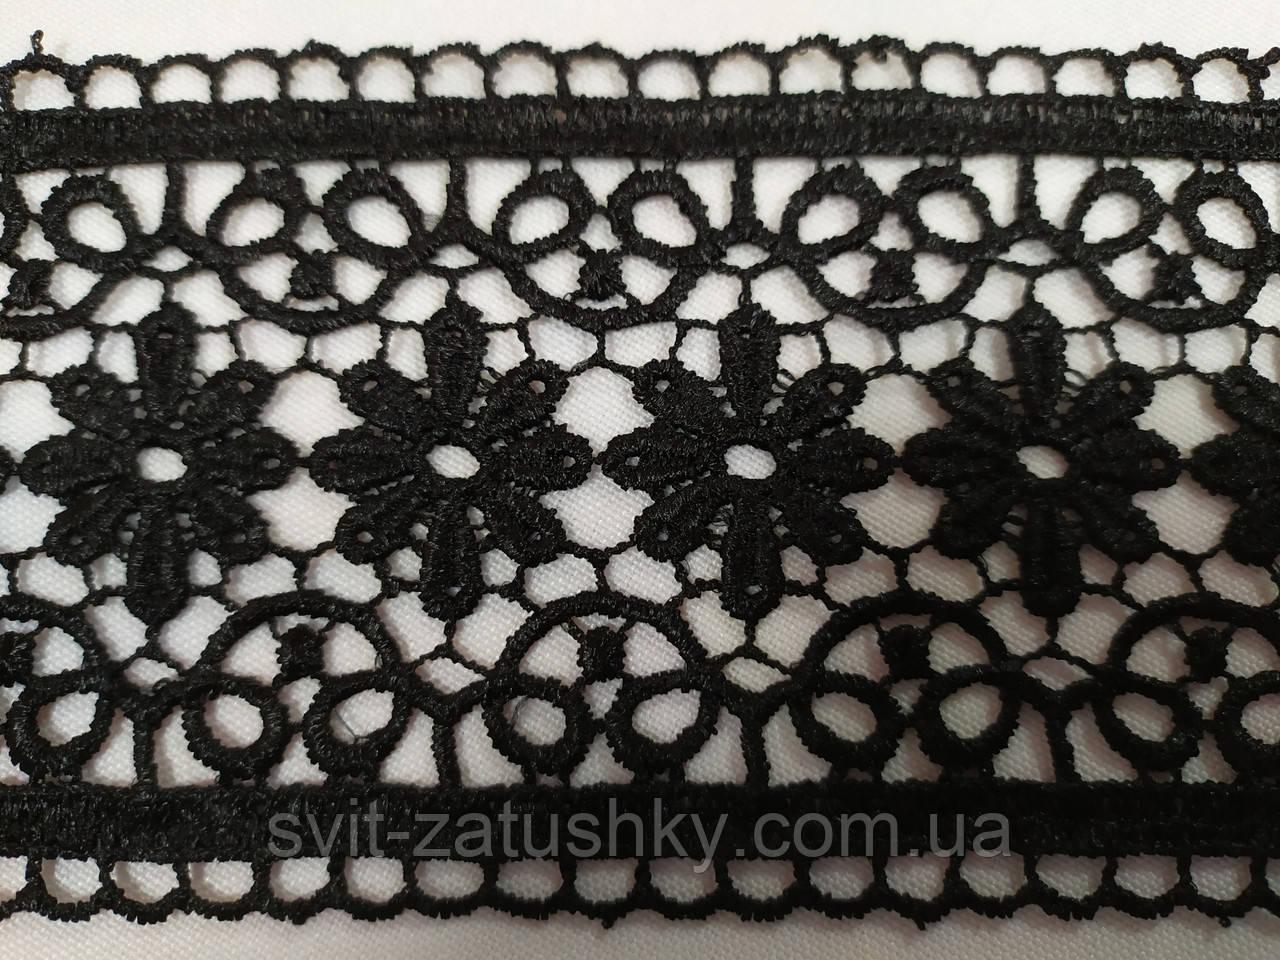 Мереживо макраме чорне ширина 7 см  /Кружево макраме черное плотное ширина 7 см